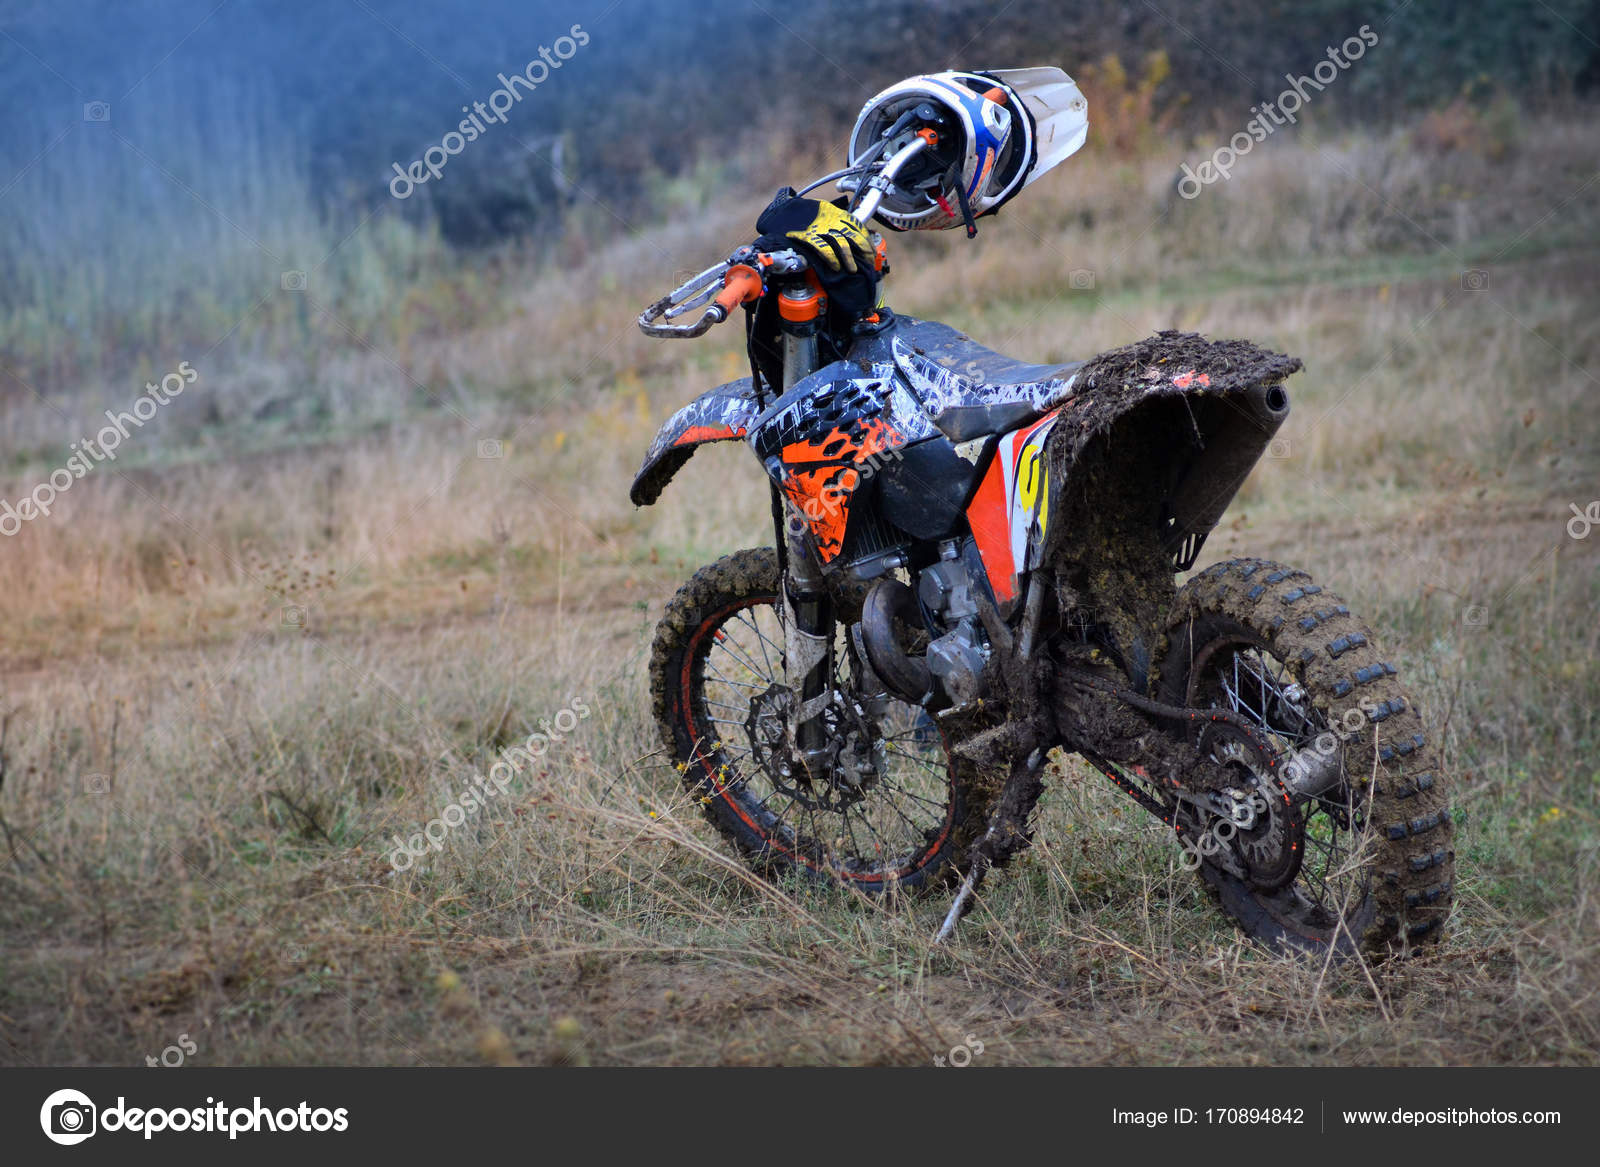 Motorcycle For Motocross Is On The Track After The - Papel De Parede De Moto De Trilha , HD Wallpaper & Backgrounds